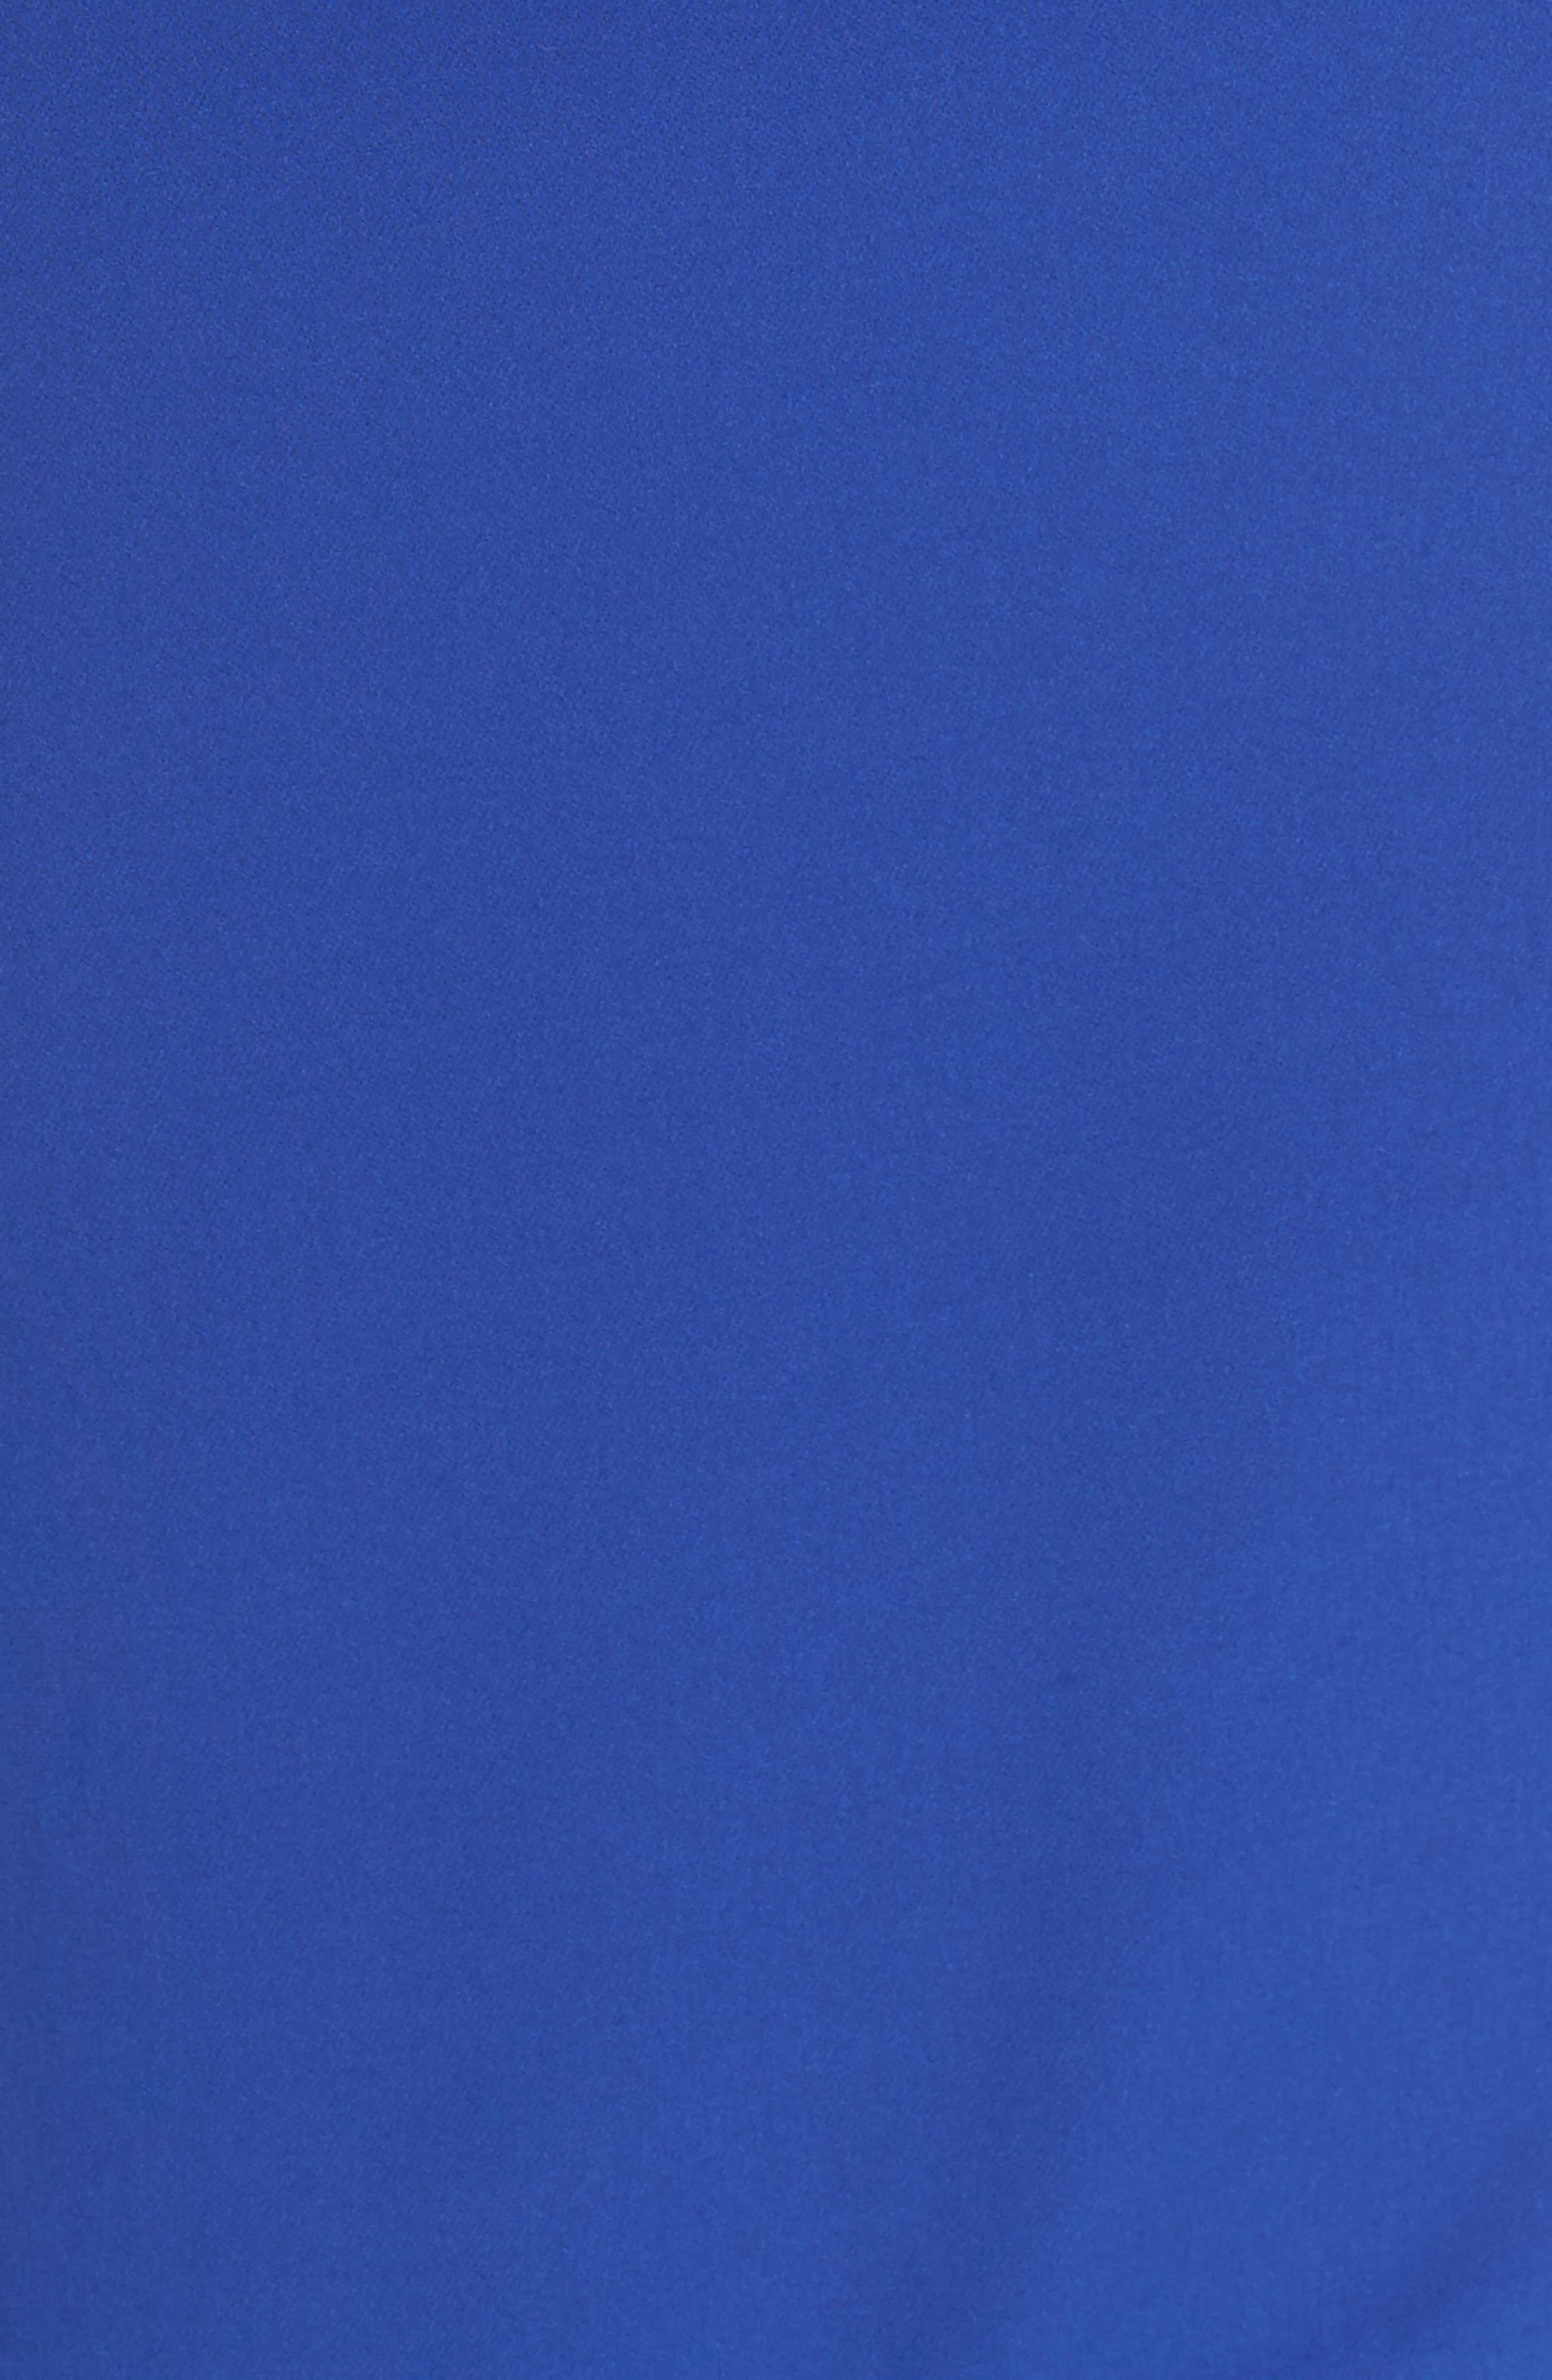 Ruffle Stretch Crepe Sheath Dress,                             Alternate thumbnail 27, color,